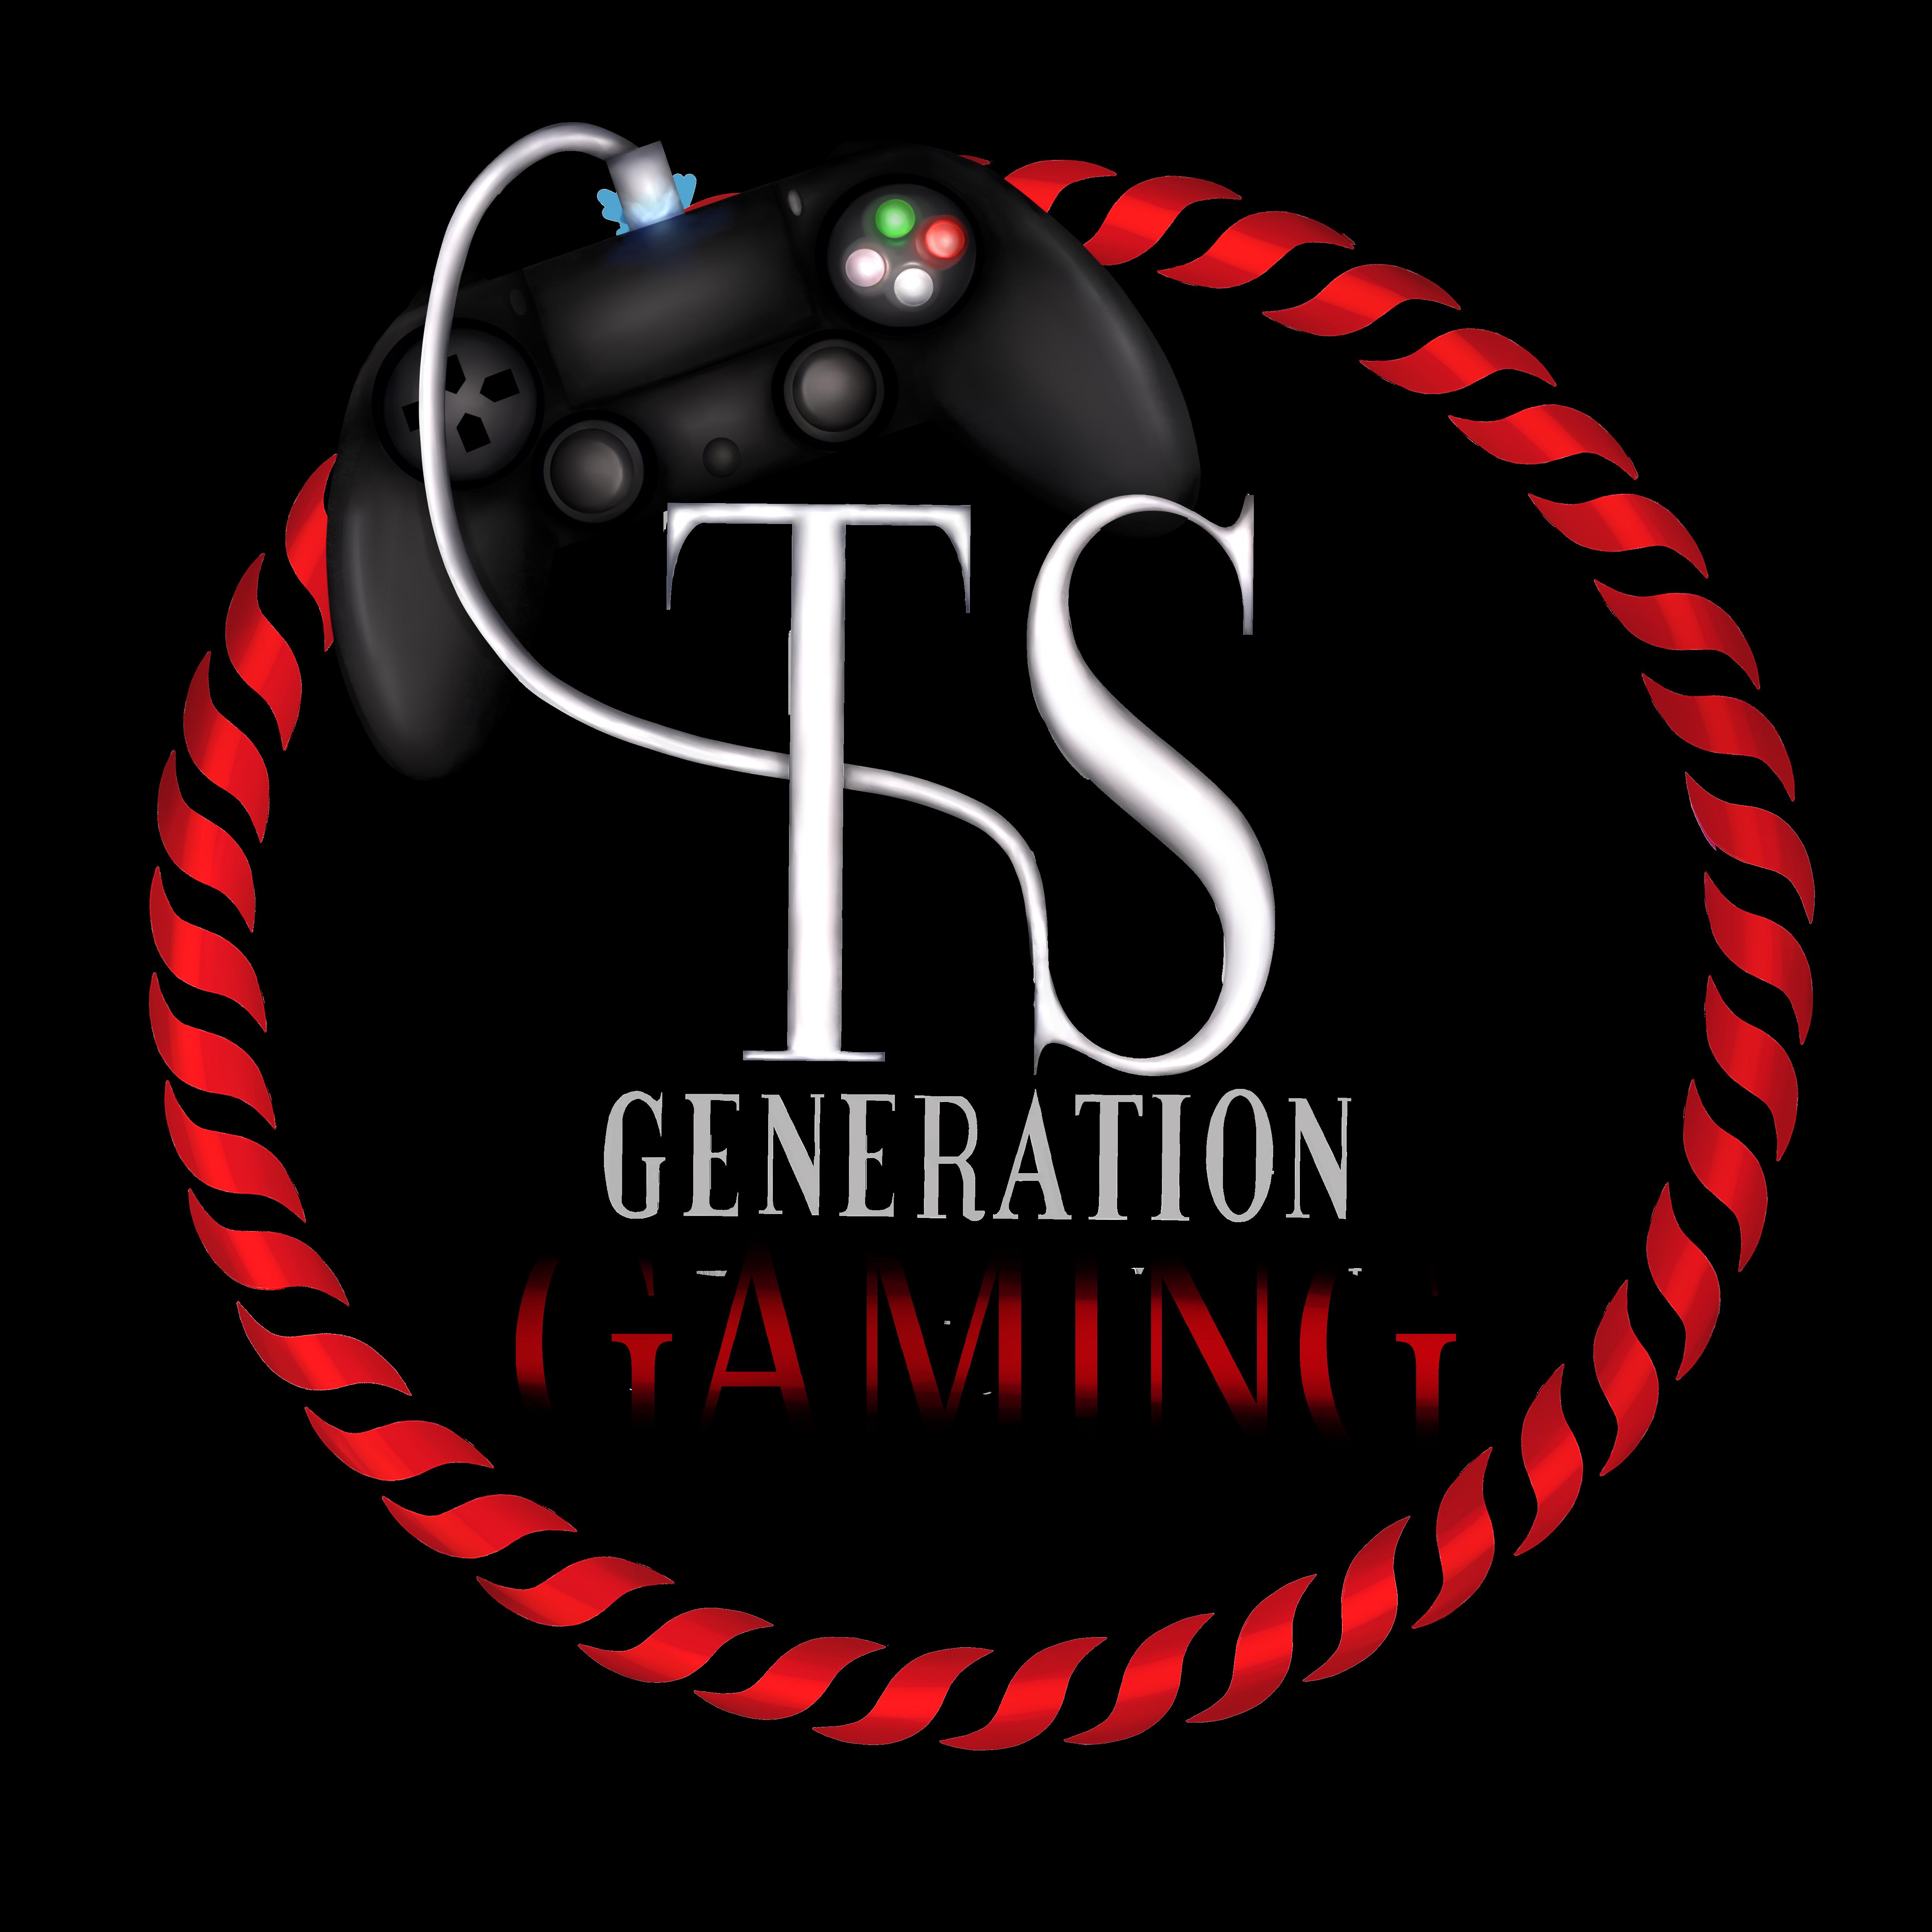 TS Generation